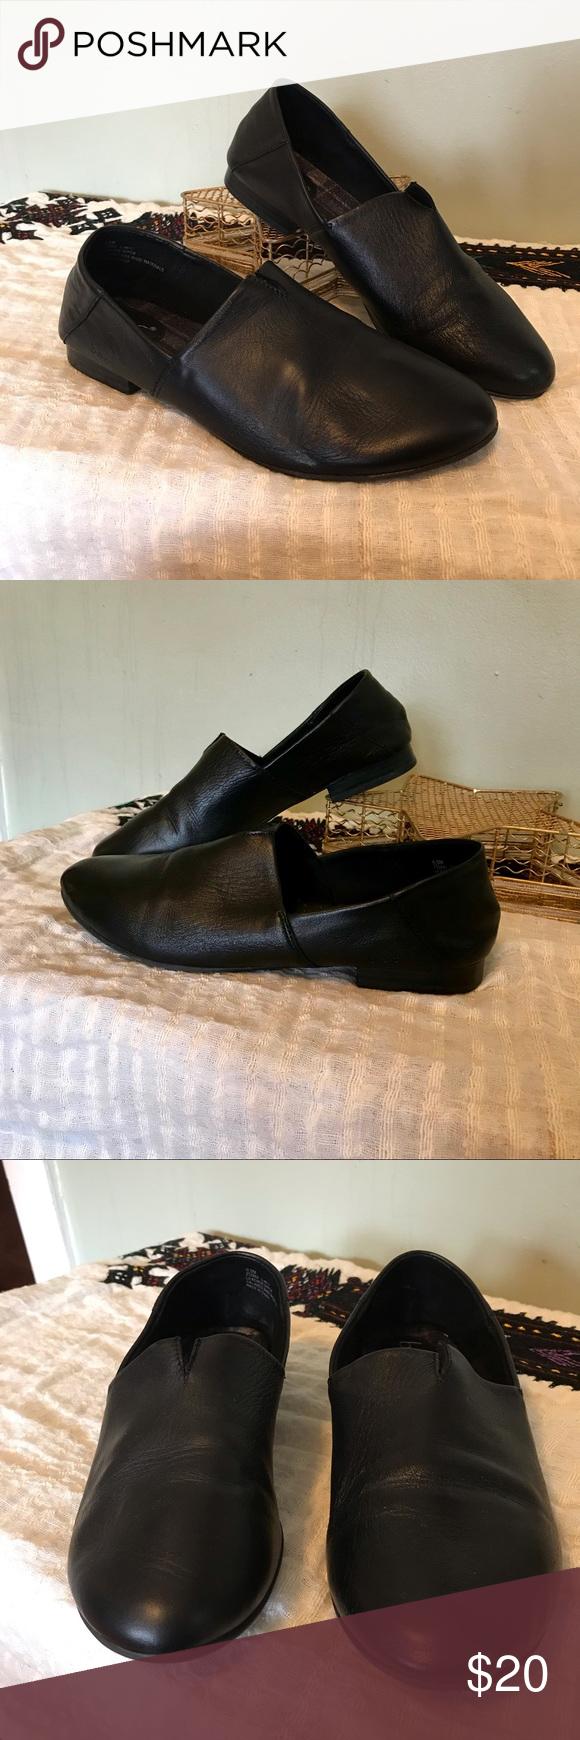 B.O.C Suree Slip-on in black Immaculate